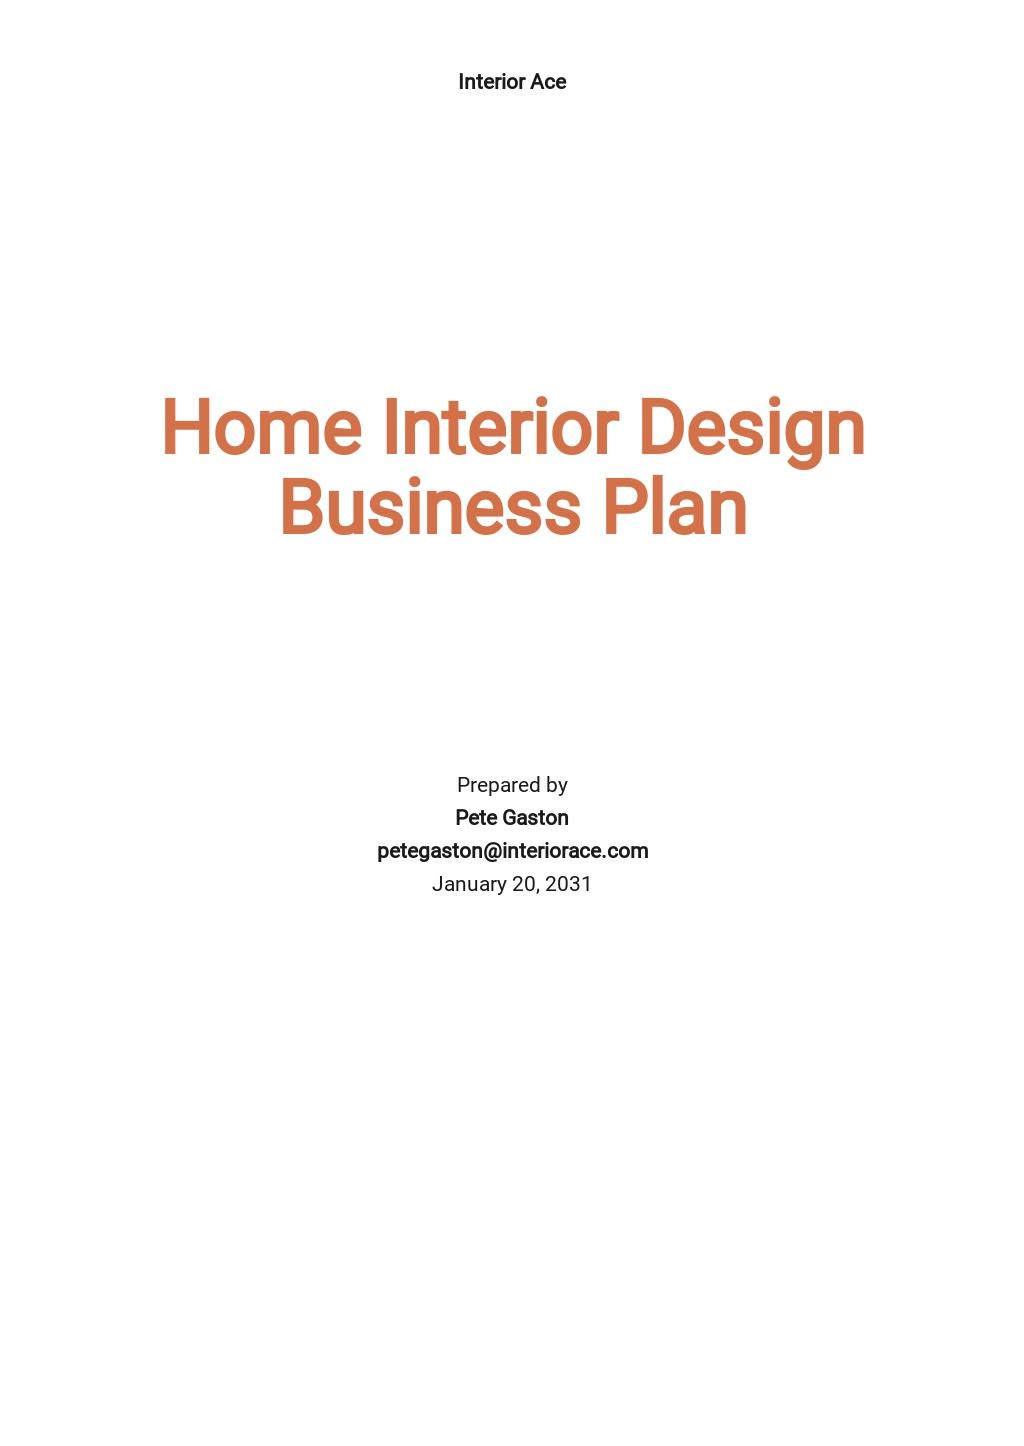 Home Interior Design Business Plan.jpe